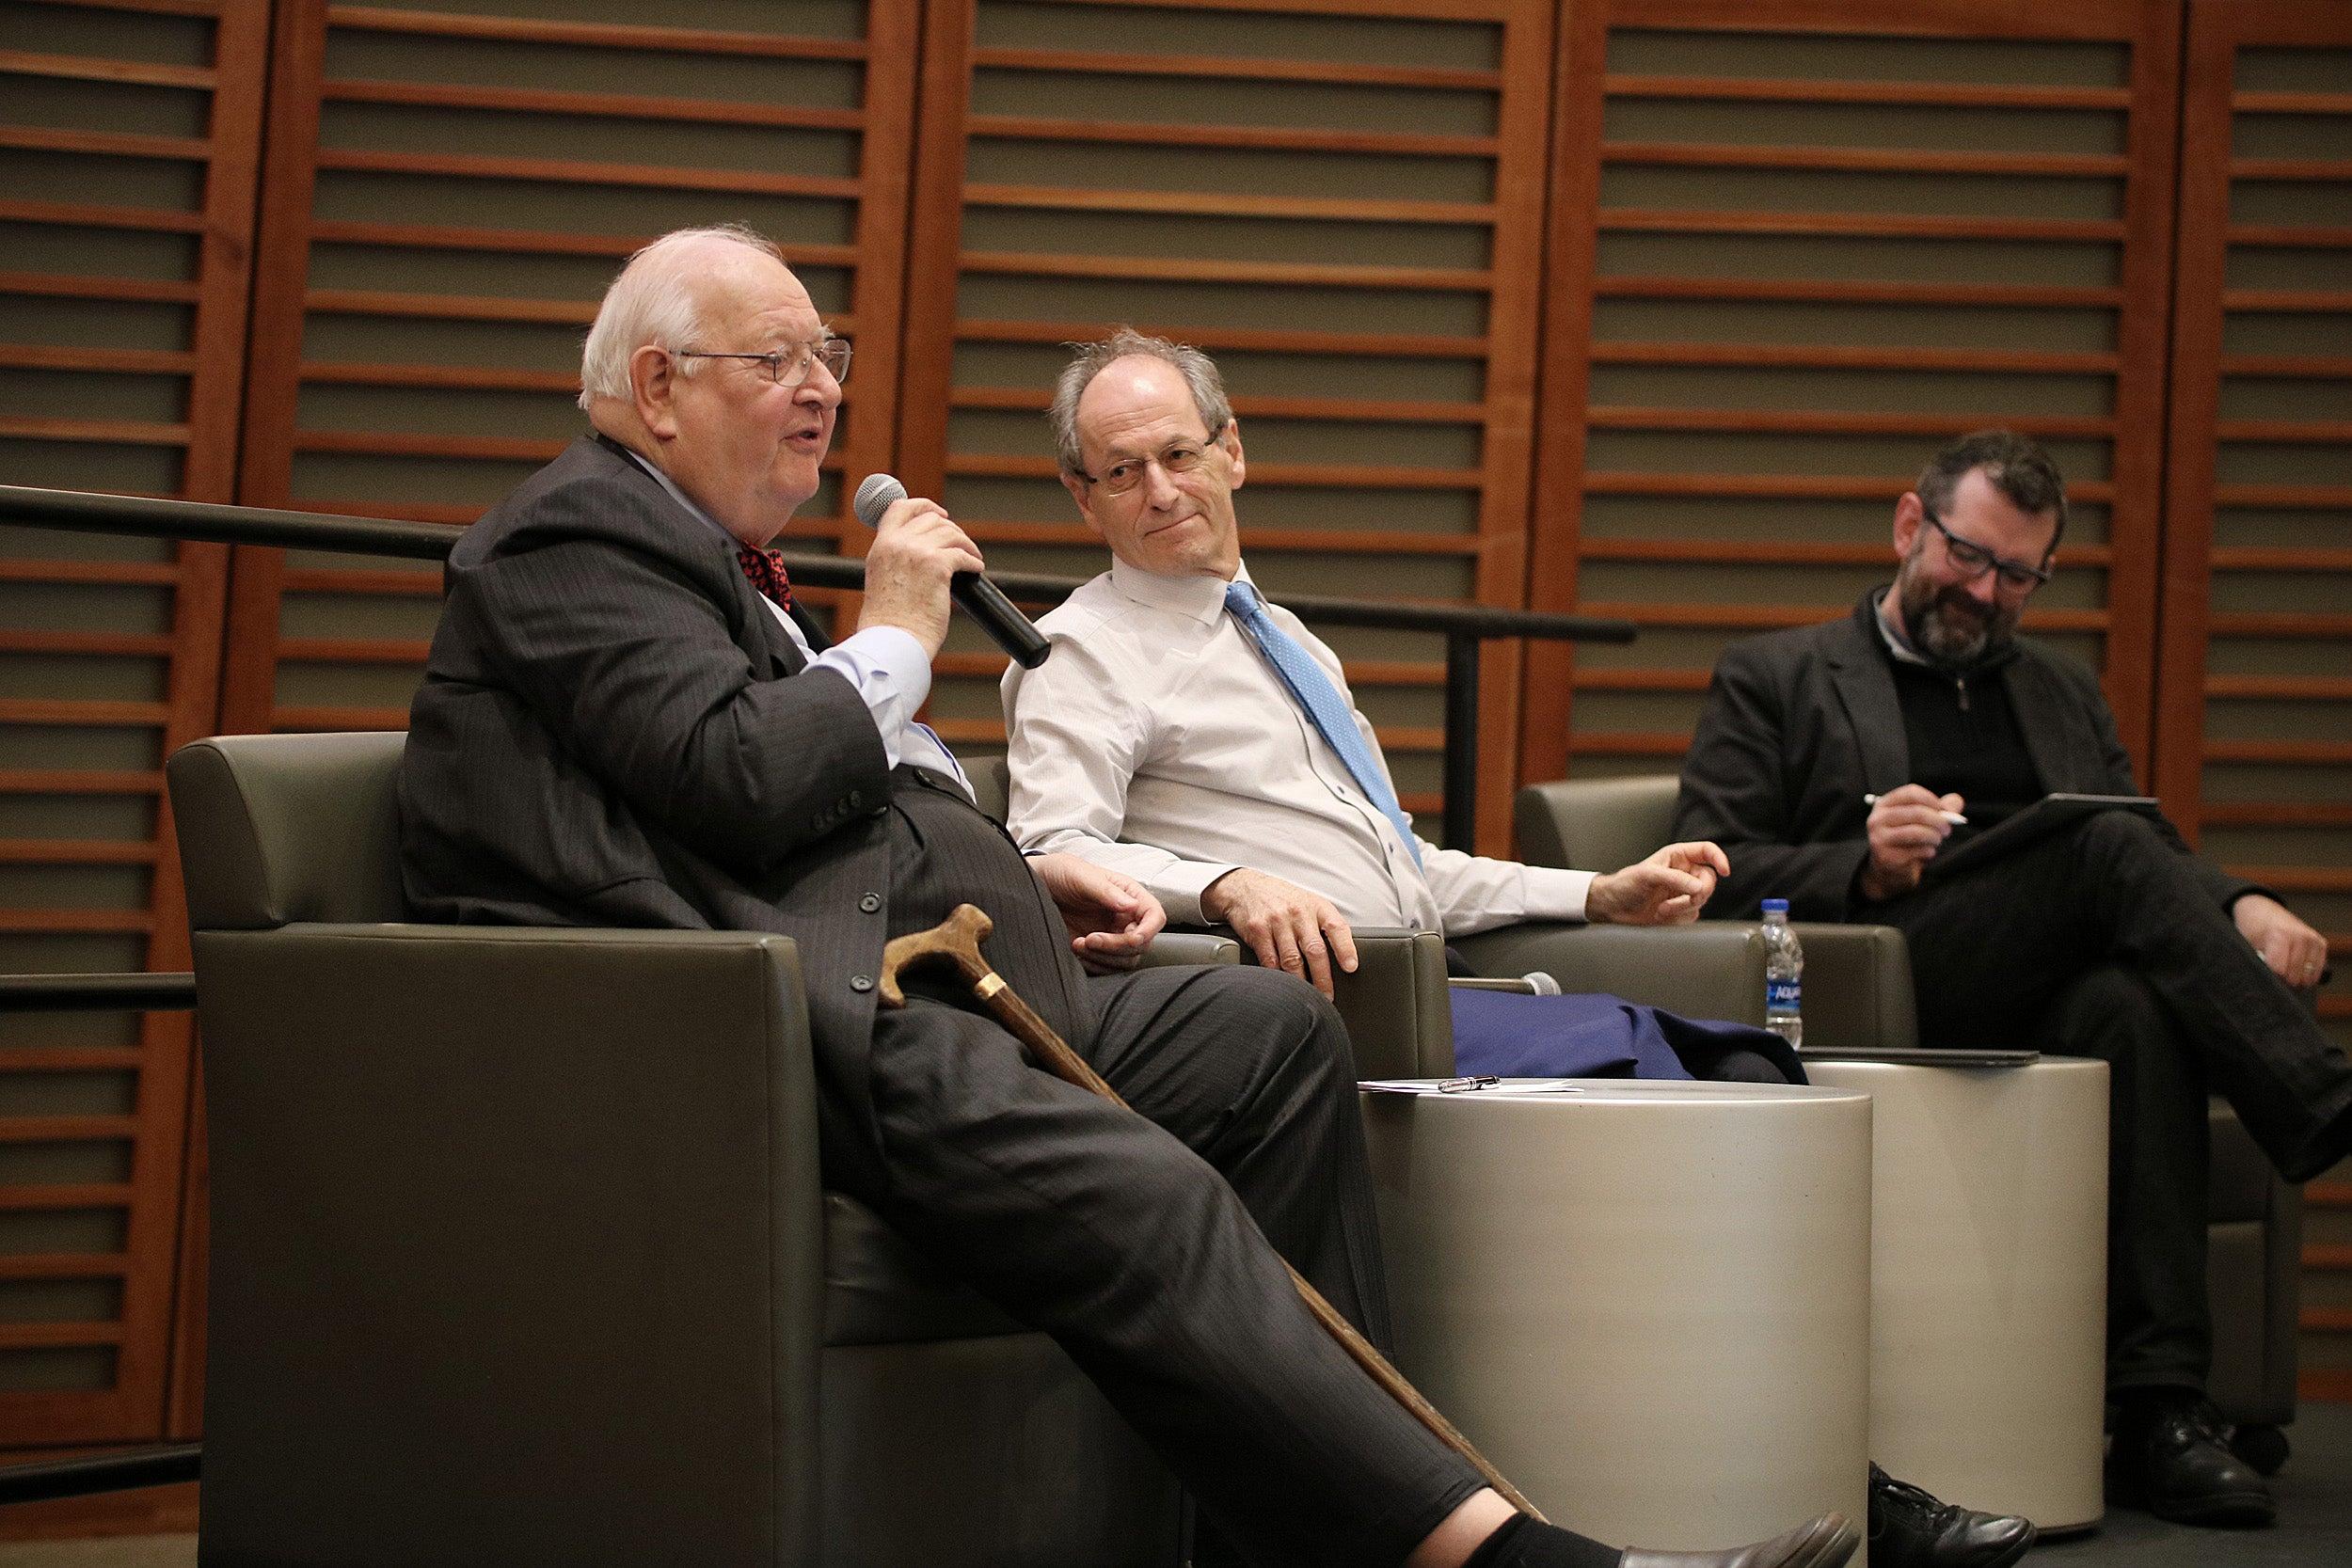 Angus Deaton (from left), epidemiologist Michael Marmot, and Professor Jason Beckfield